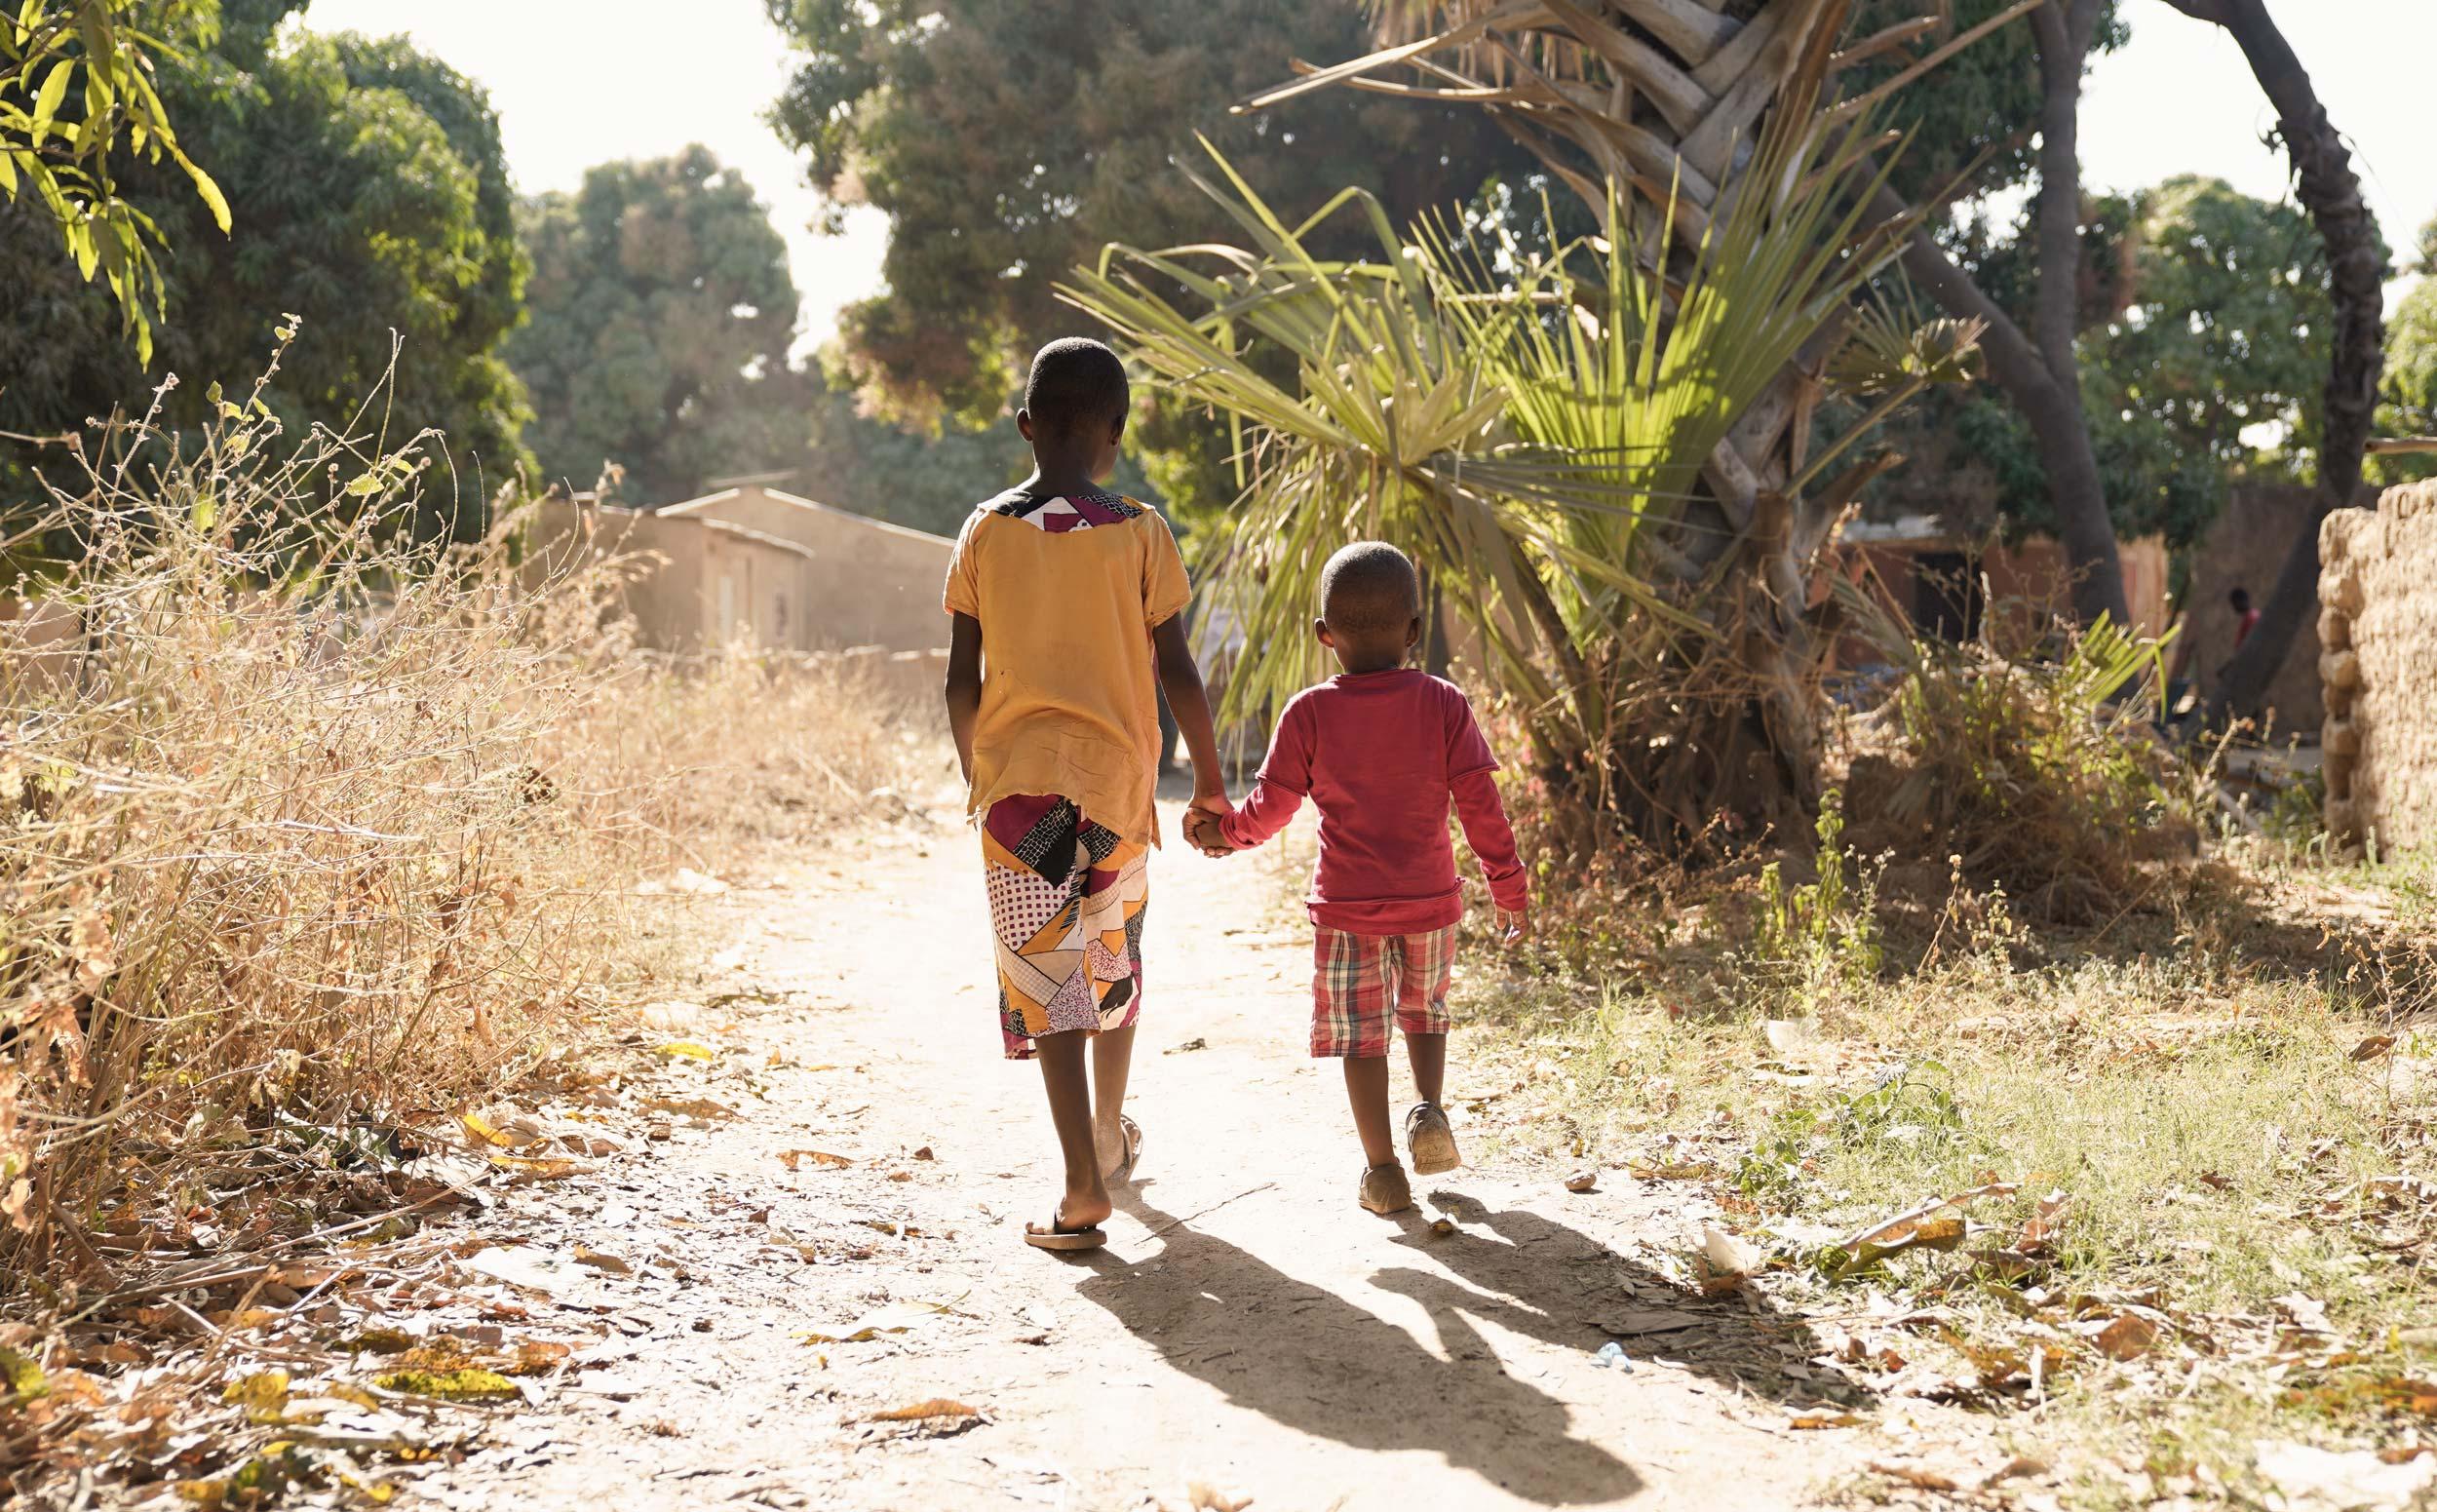 Boys walking holding hands